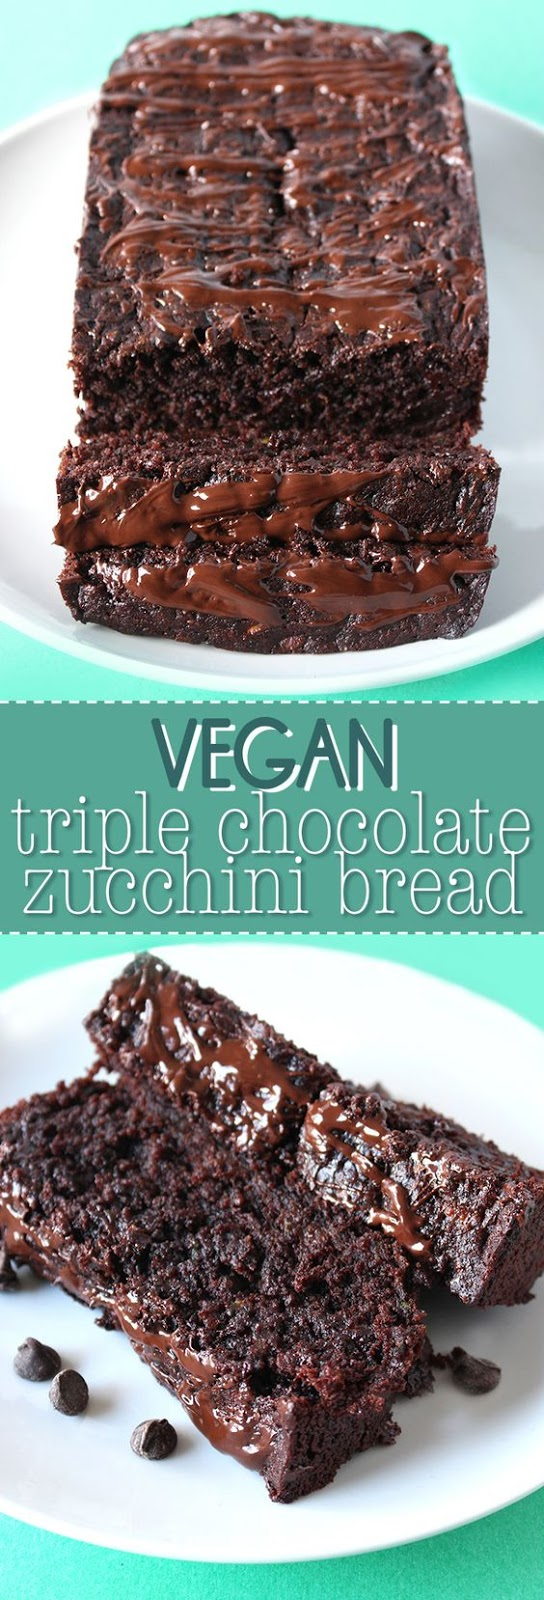 Vegan triple chocolate zucchini bread